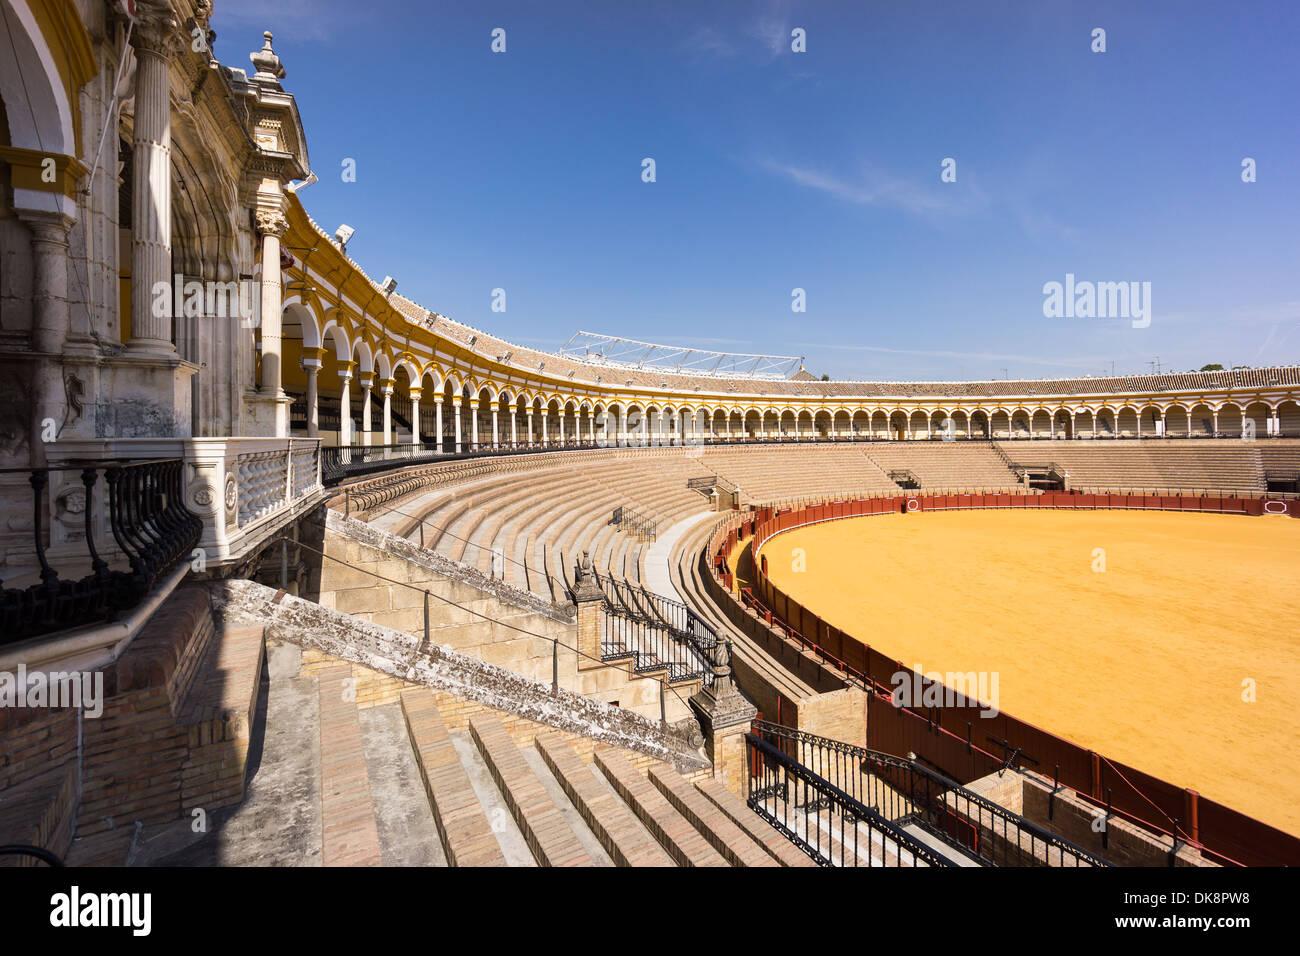 Plaza de Toros de Sevilla, La Real Maestranza de Caballería de Sevilla, Seville's bullring - Stock Image